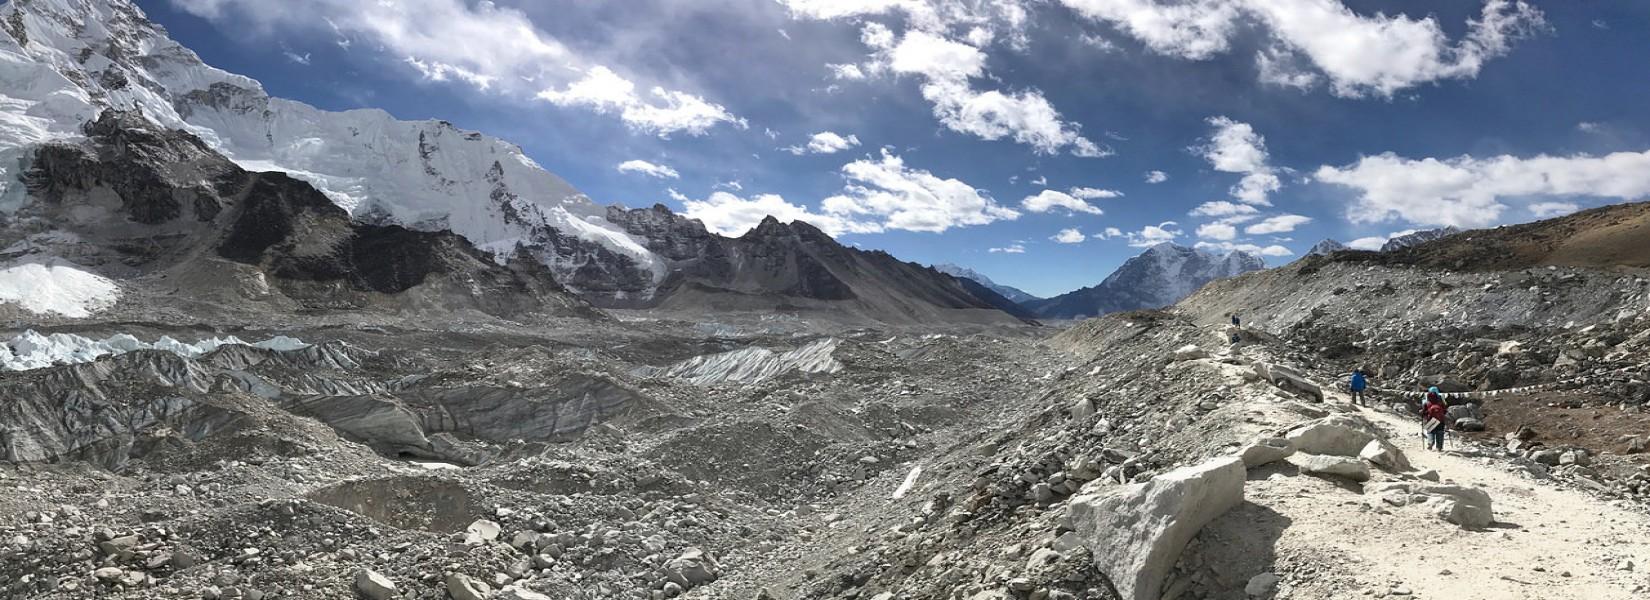 Everest Base Camp Trekking - Helicopter  Flight